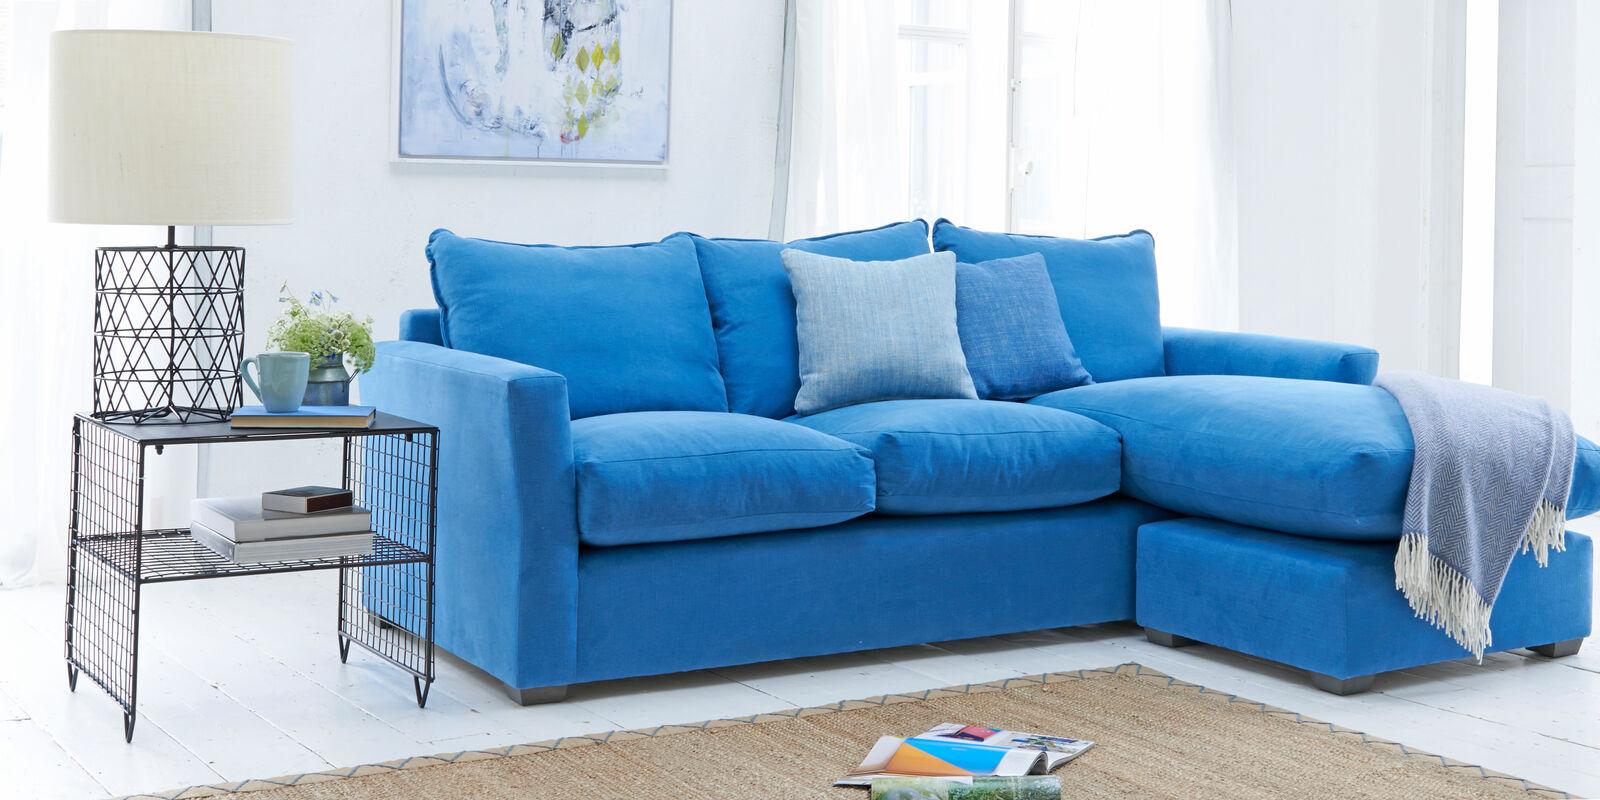 Contemporary pavilion British made L shape corner sofa